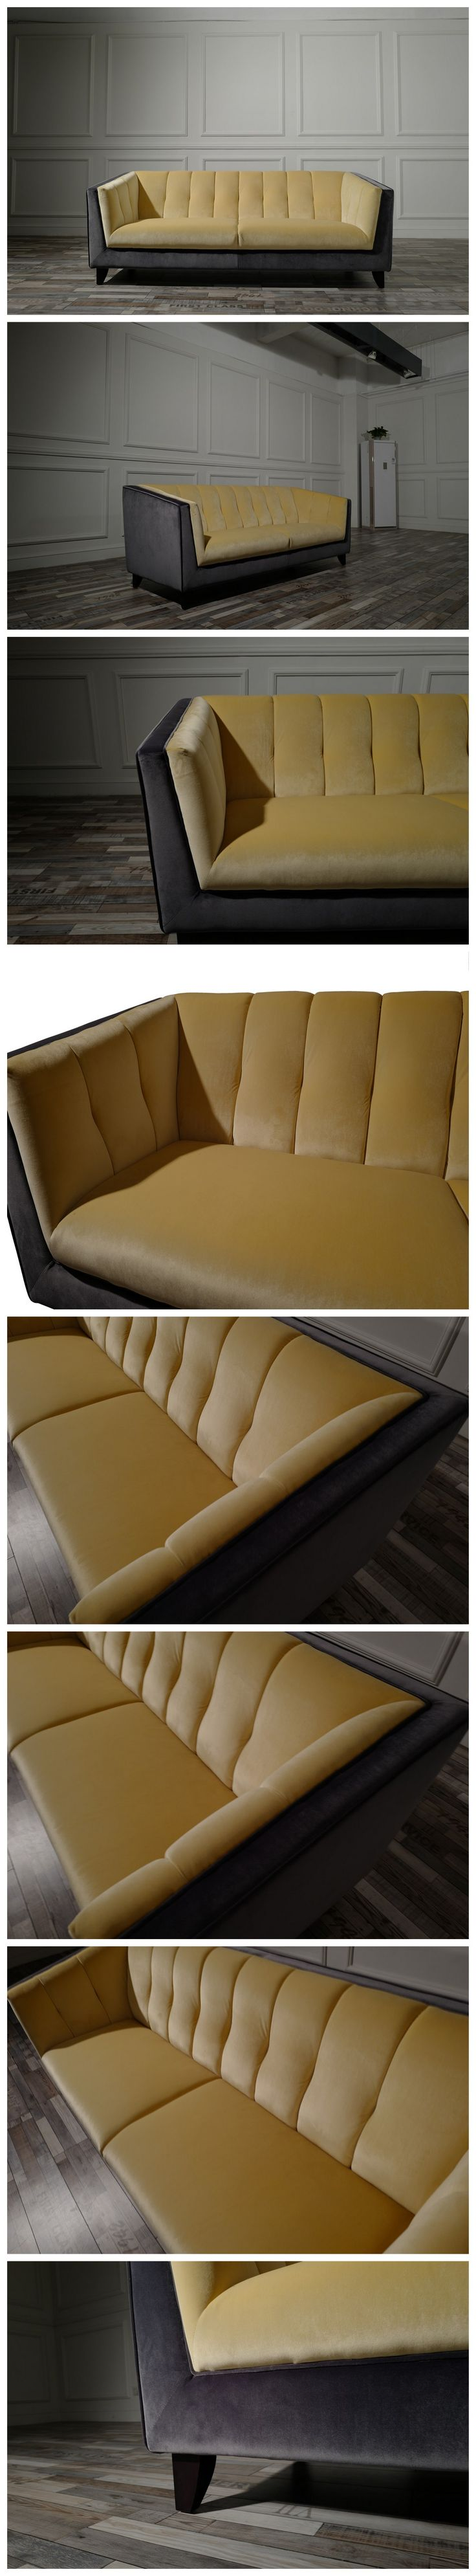 new design modern sofa set #sofaset #sofa #cocheen #modernsofa #cocheendesign #livingroomsofa #furniture #newdesign #sectionalsofa #homefurniture #couch #furniturefactory #CIFF #cantonfair contact:jennifer@cocheen.com online store link: cocheenfurniture.en.alibaba.com